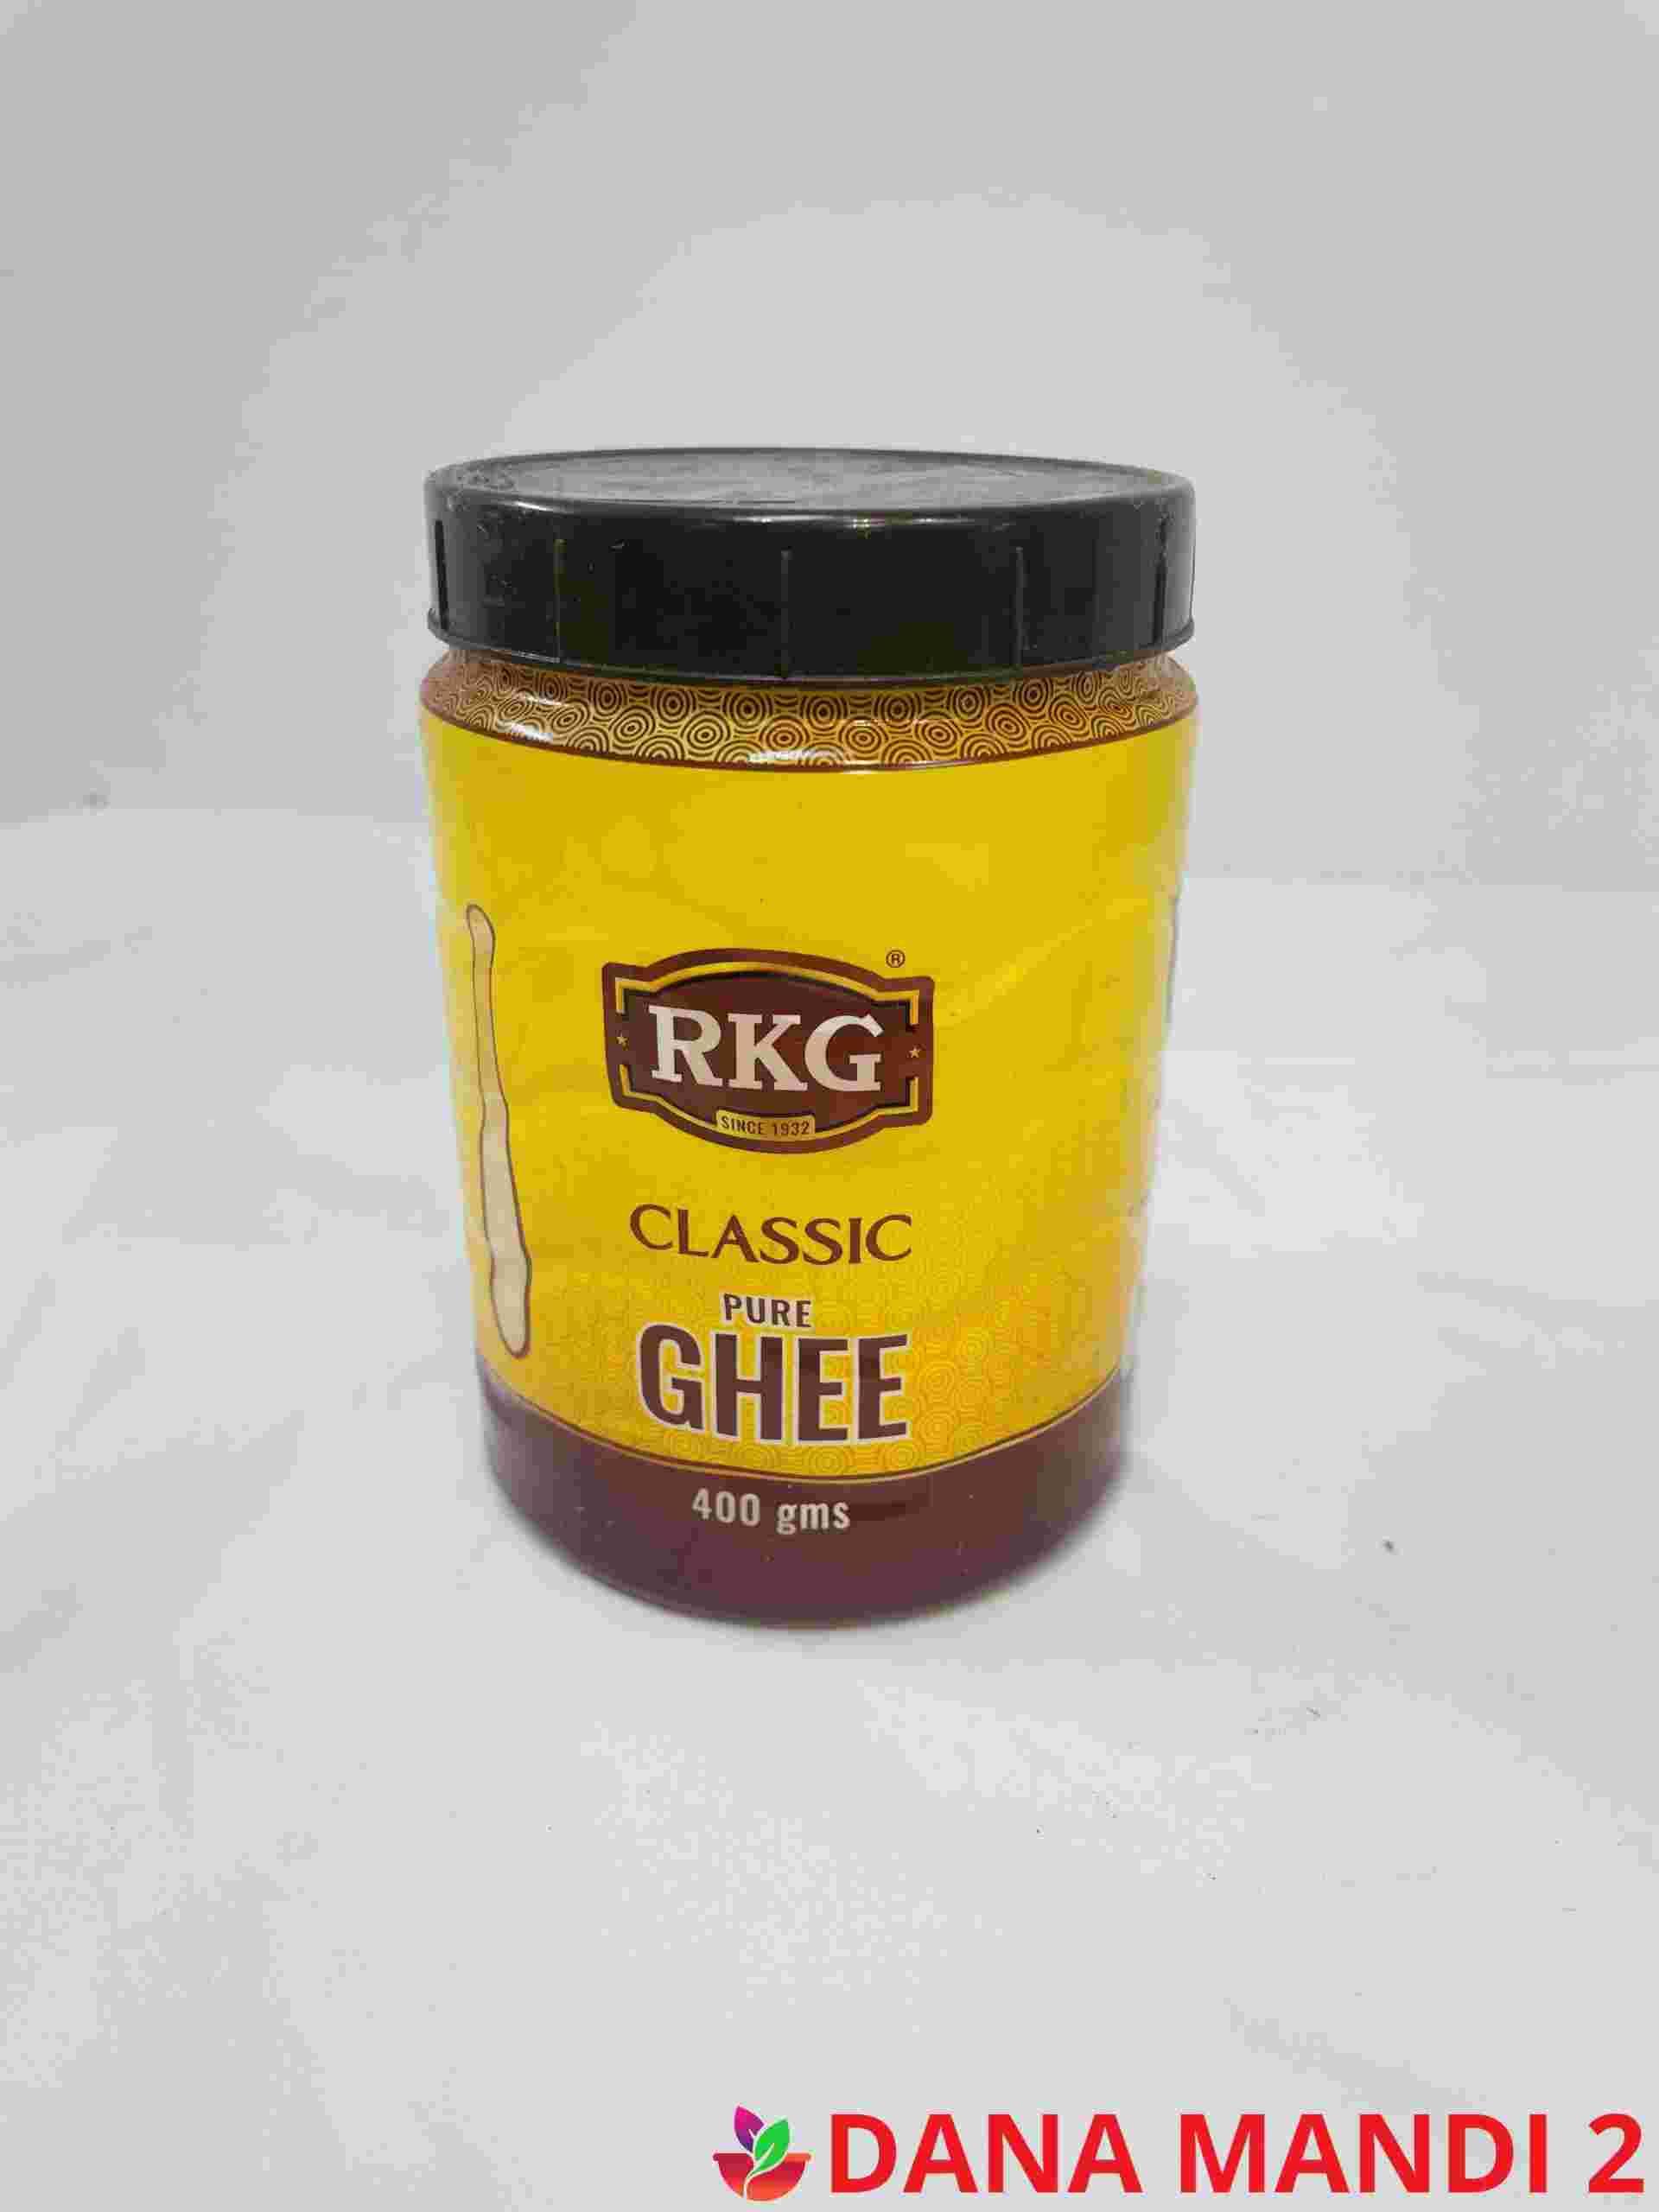 Rkg Classic Ghee